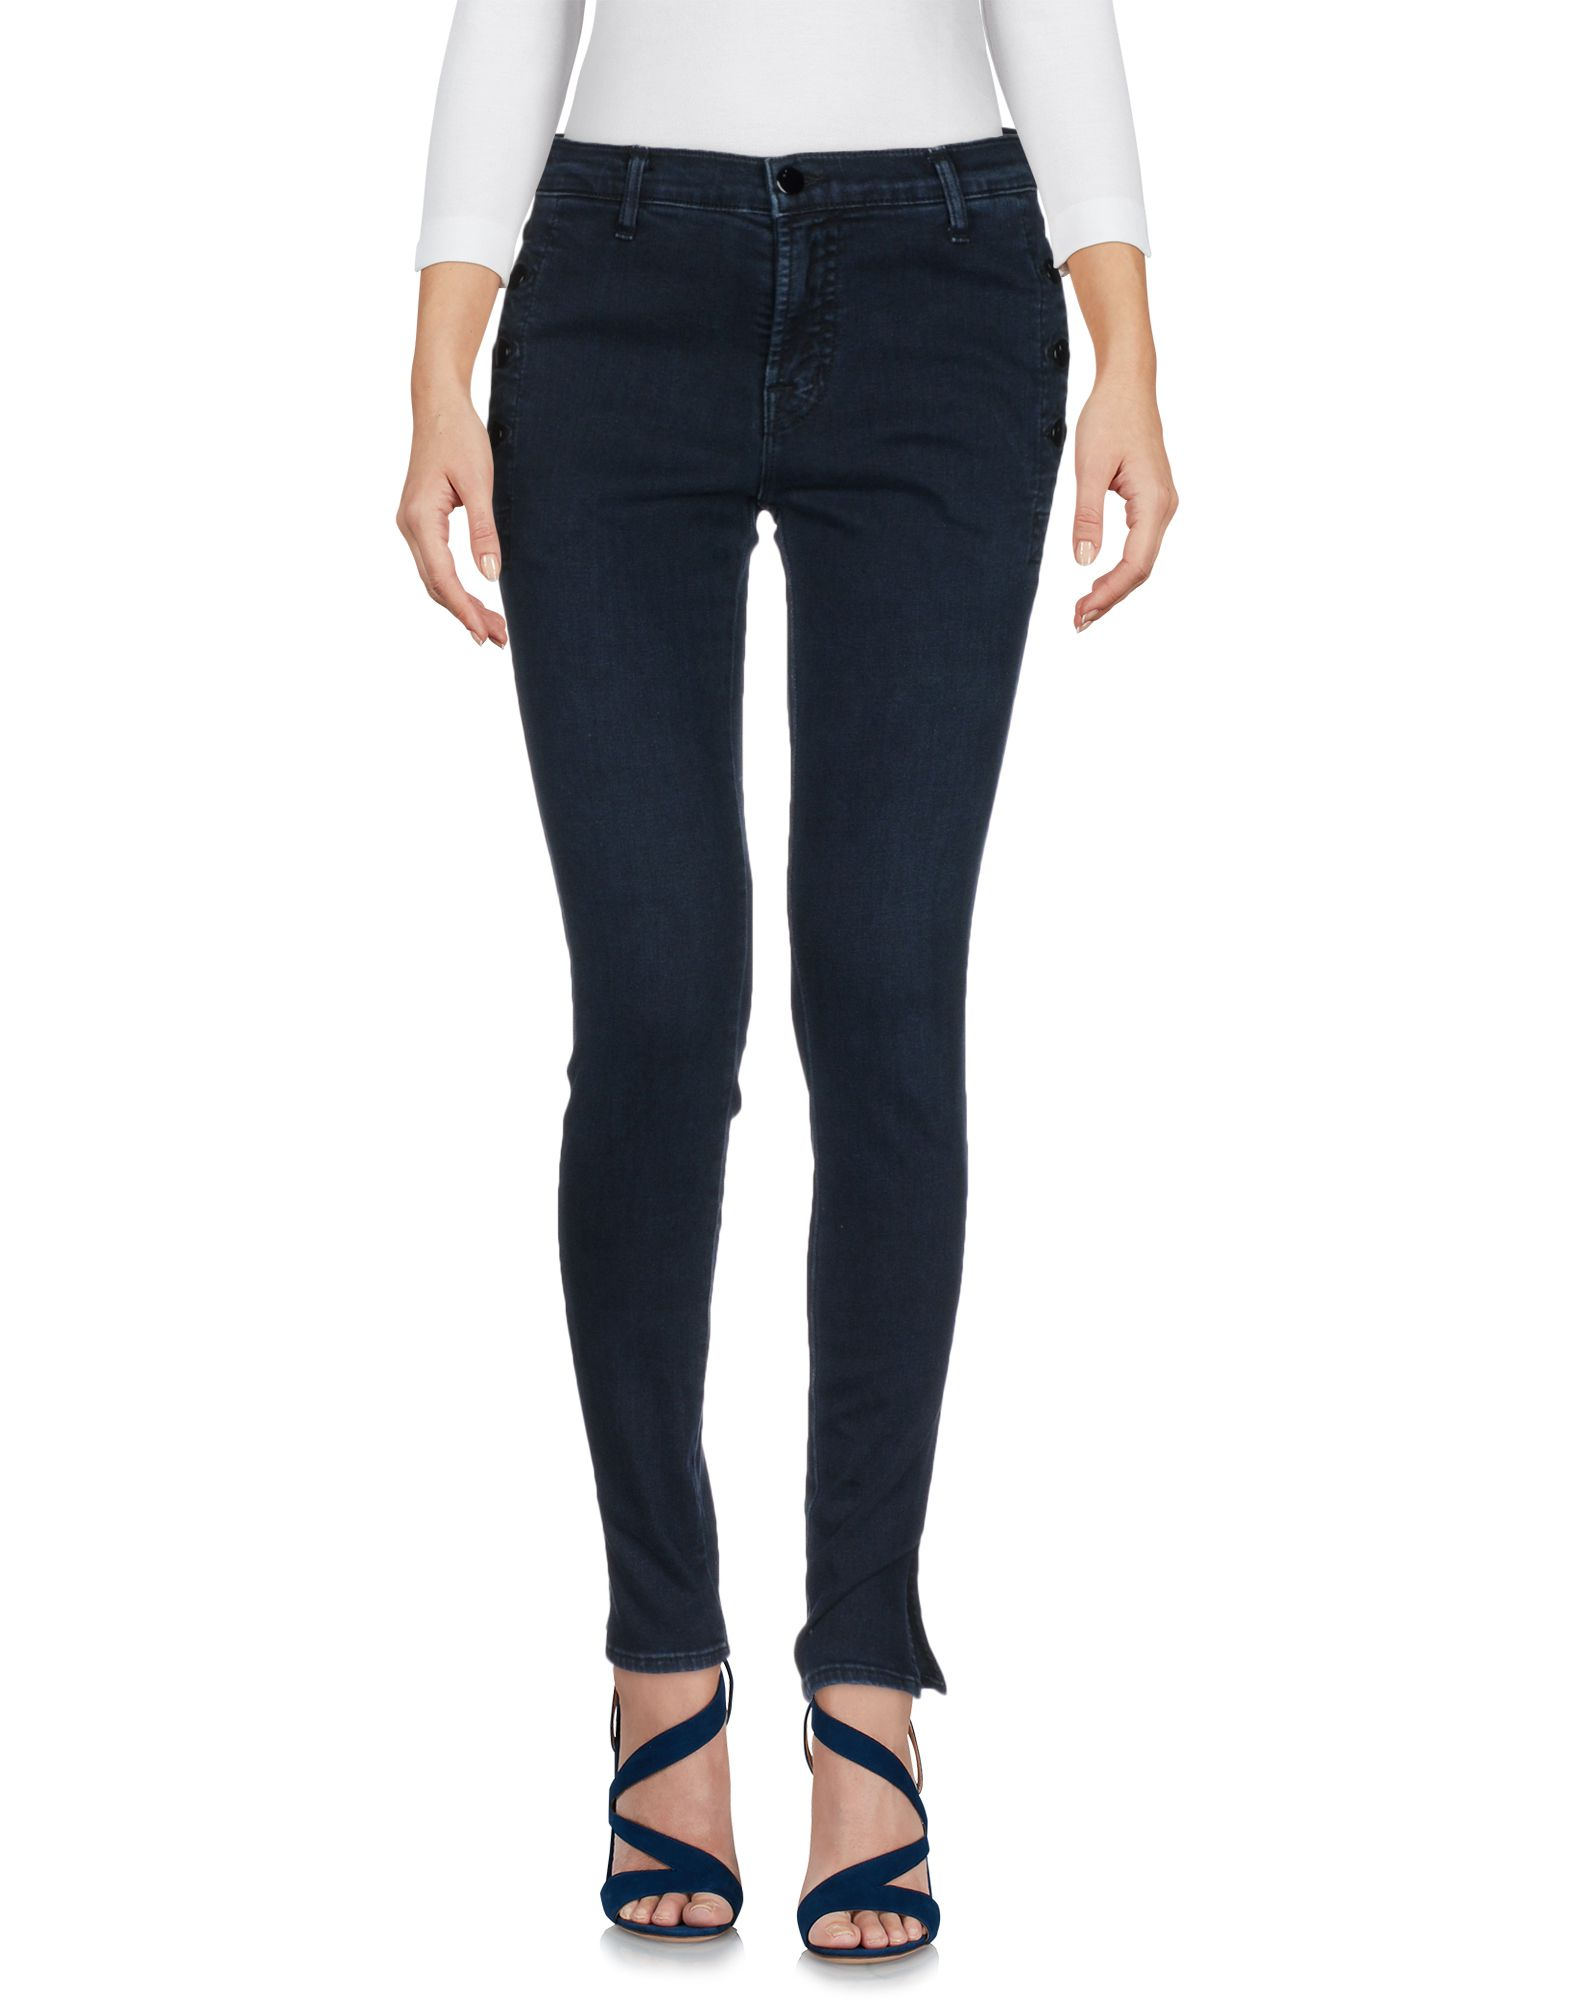 Pantaloni Jeans J Brand Donna - Acquista online su Km9G2a7